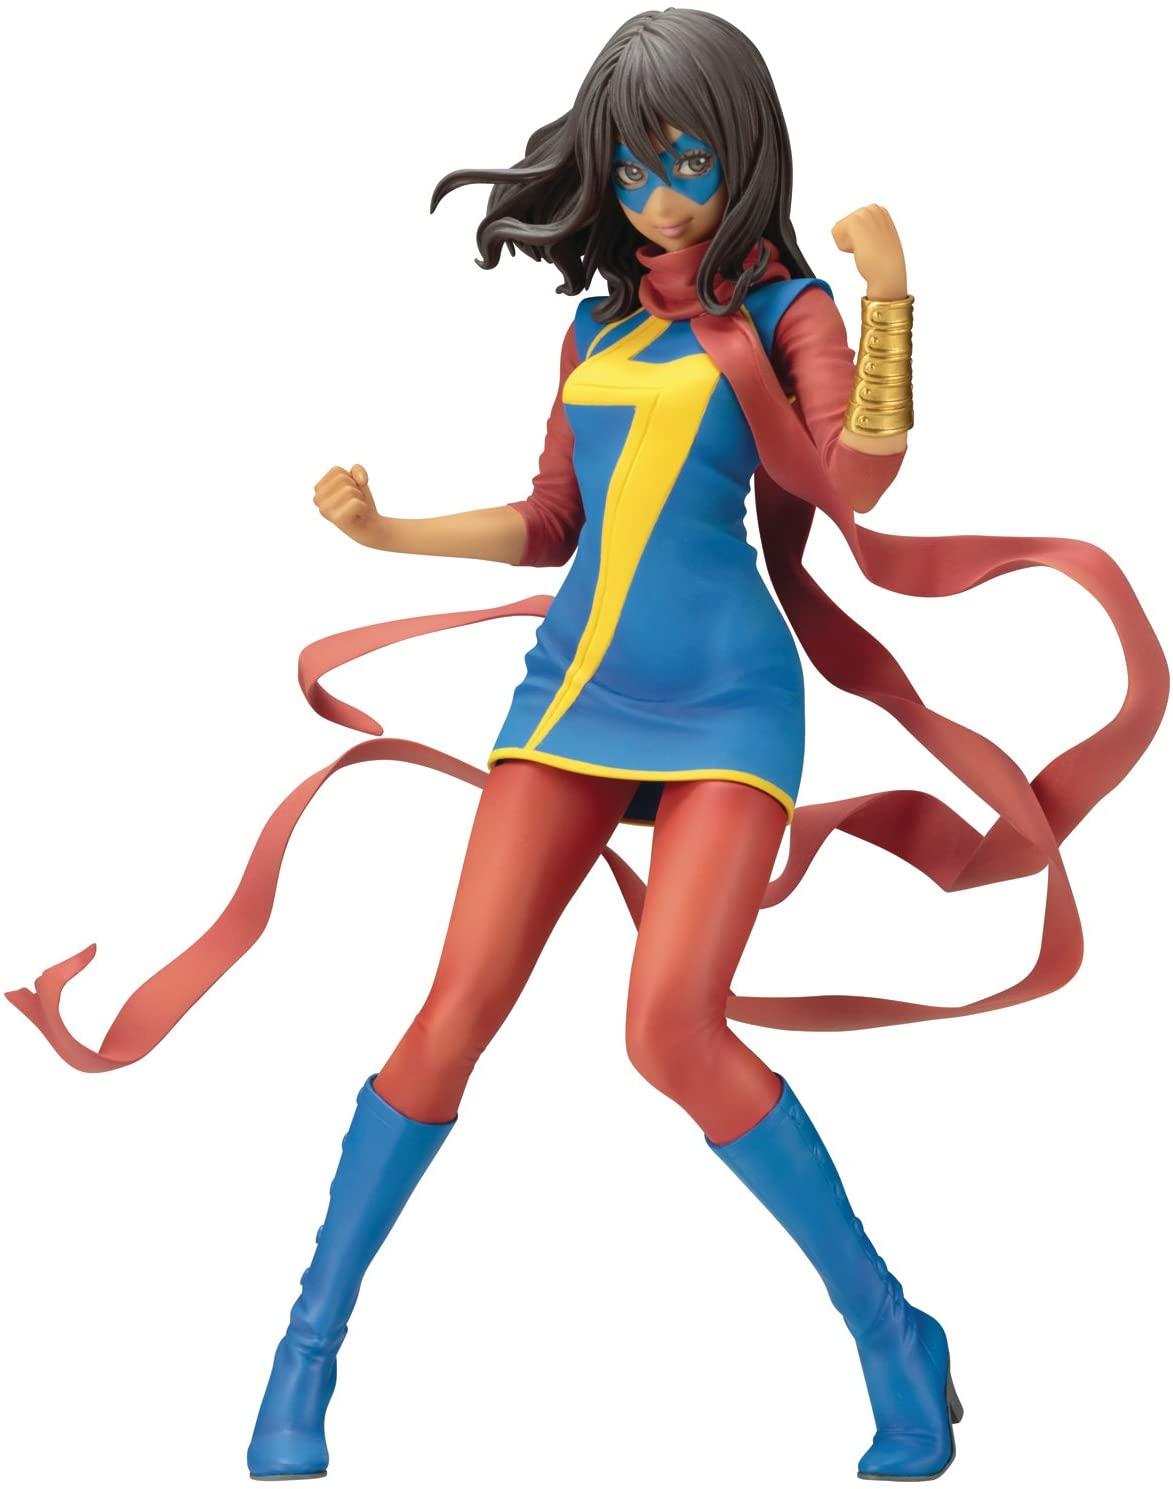 Kotobukiya Ms. Marvel (Kamala Khan) Statue